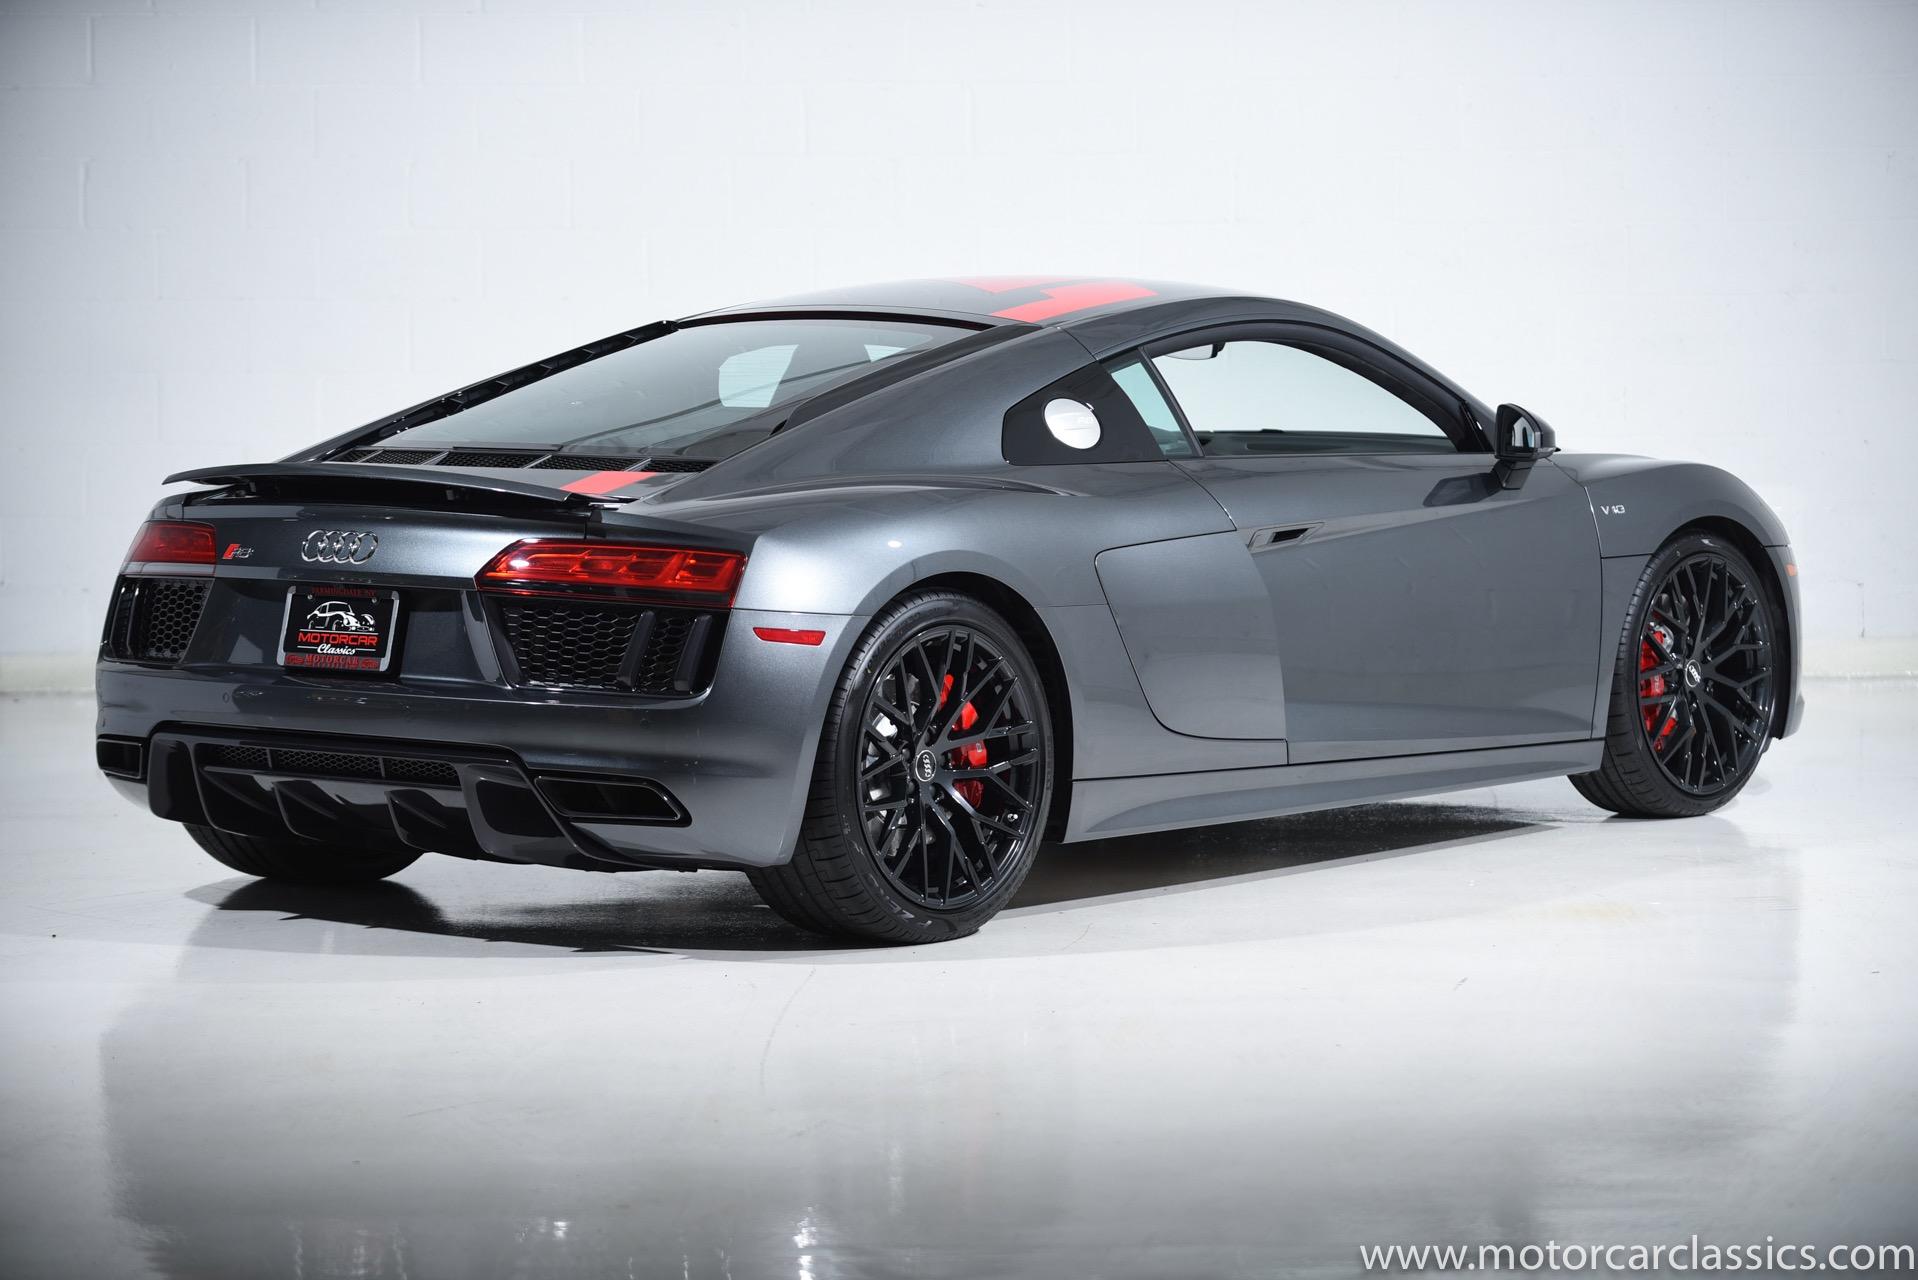 2018 Audi R8 5.2 V10 RWS